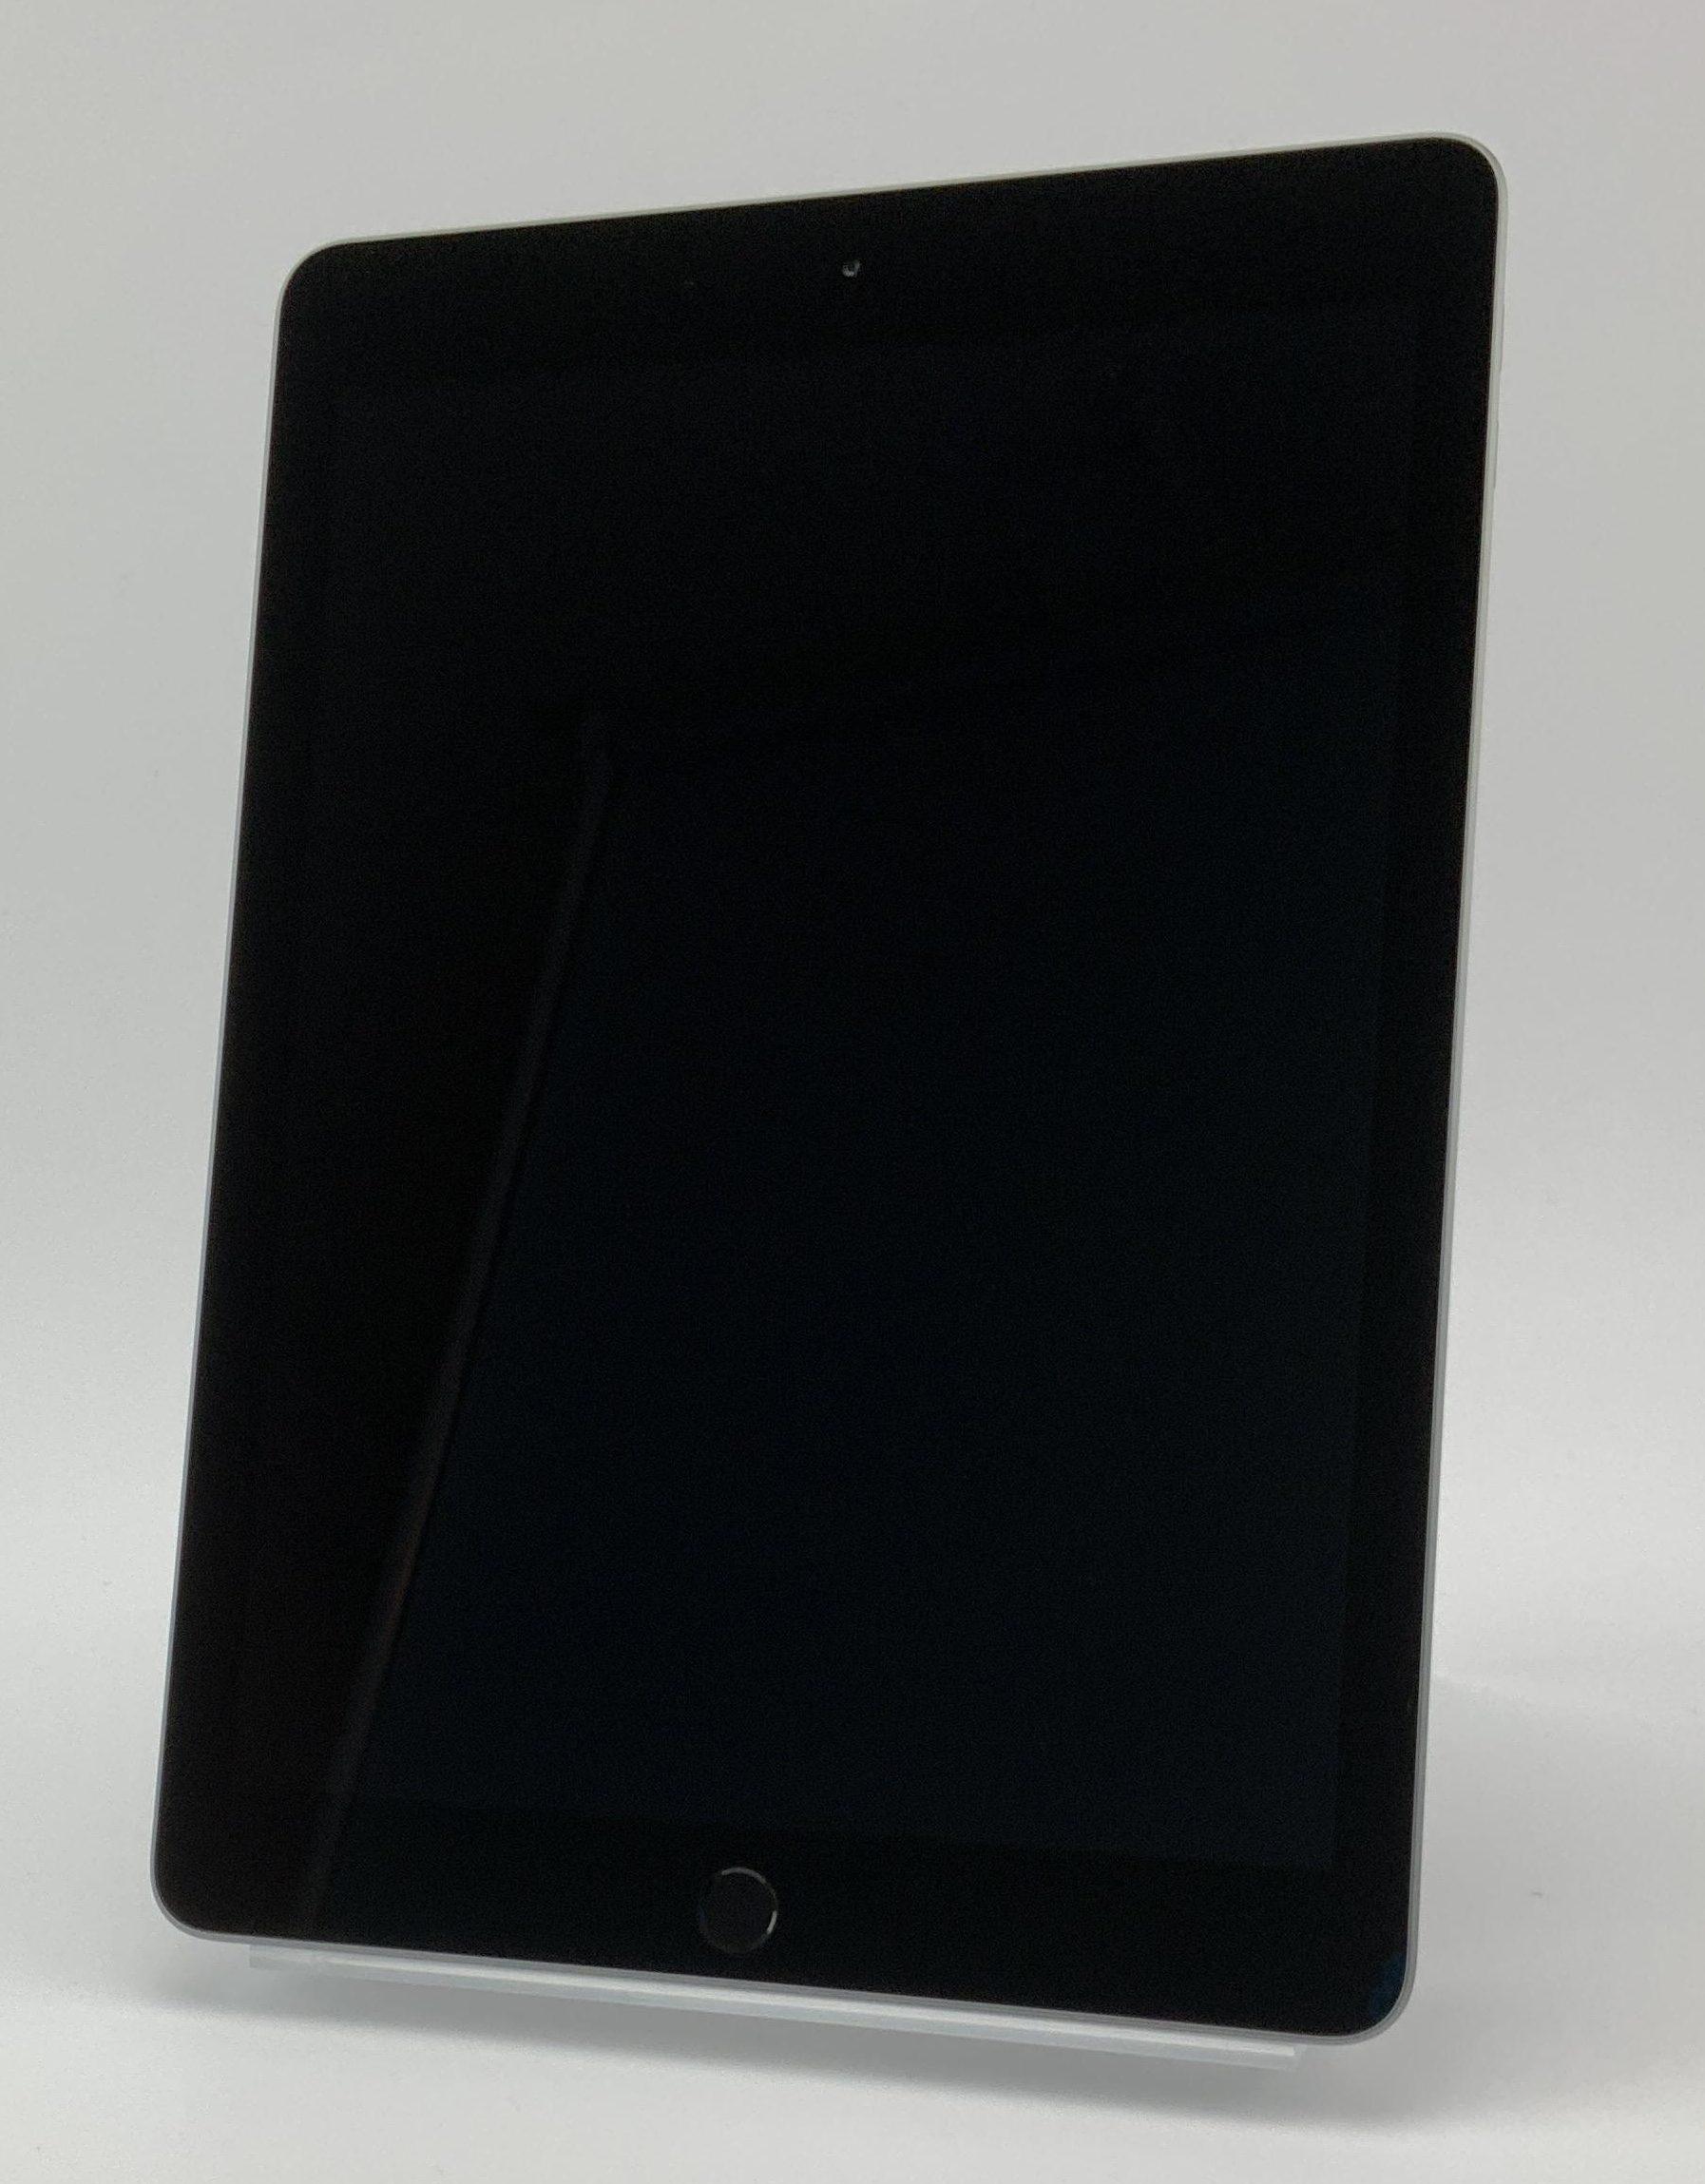 iPad 6 Wi-Fi 128GB, 128GB, Space Gray, Bild 1